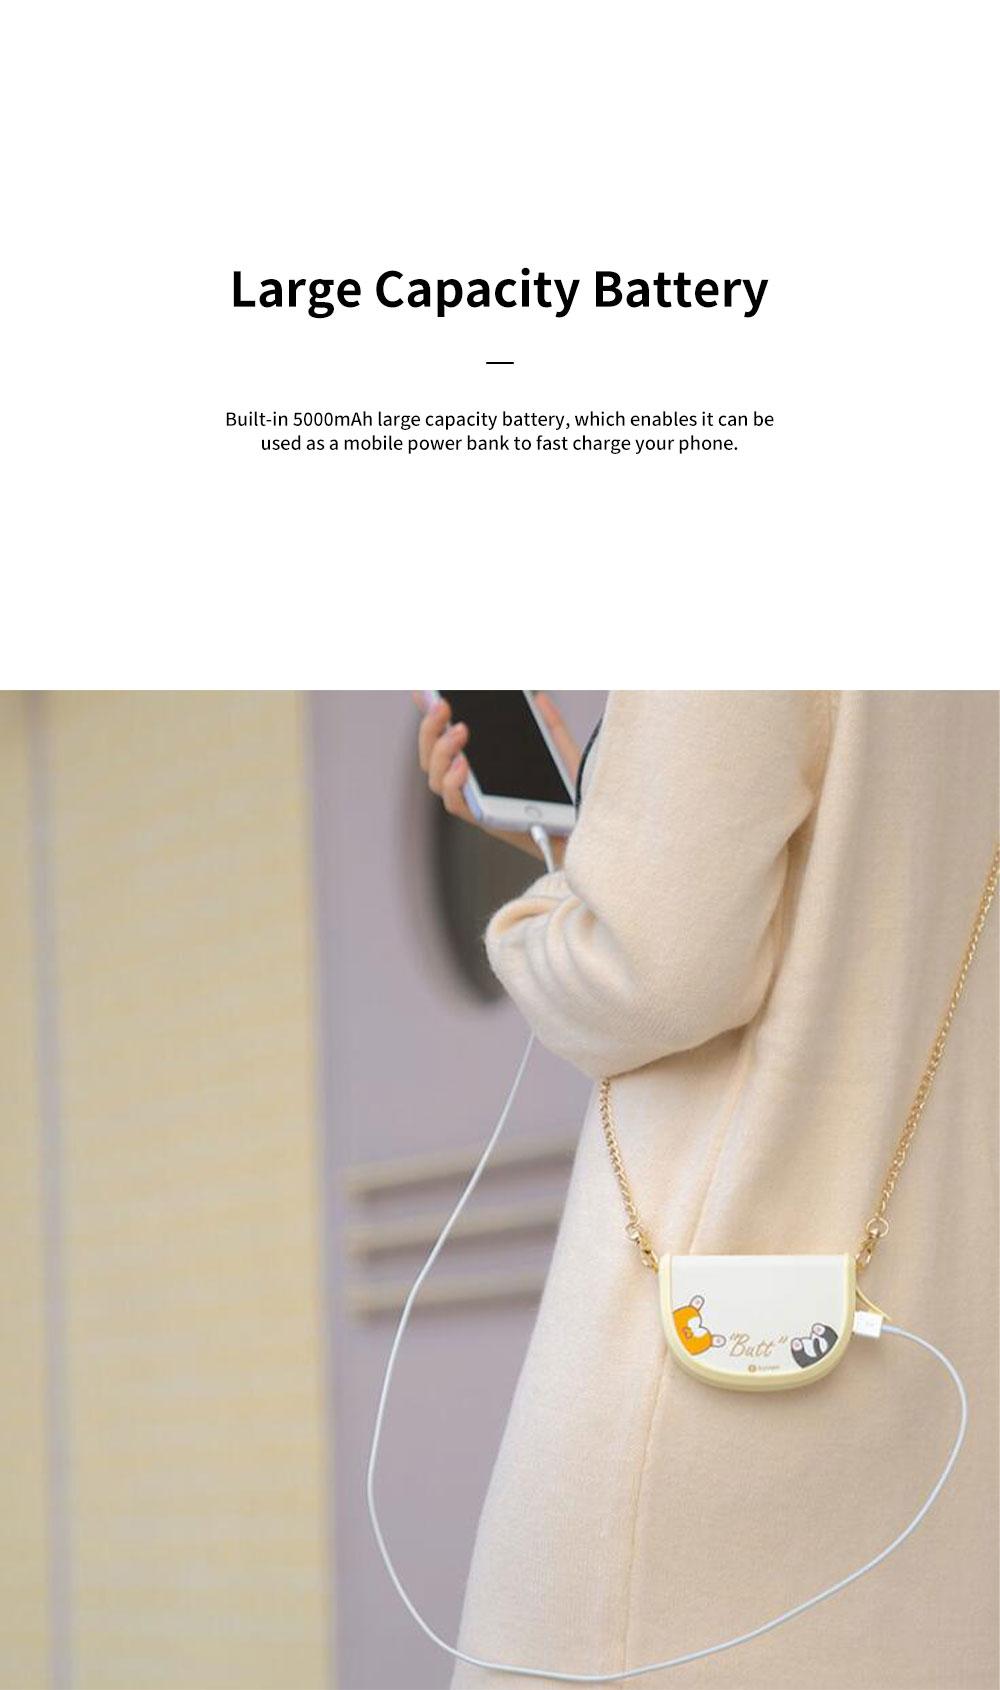 Portable Handbag Hand Warmer Unique Shoulder Bag-shaped Hands Warm Elf with 5000mAh Battery and USB Port for Phone Charging 4